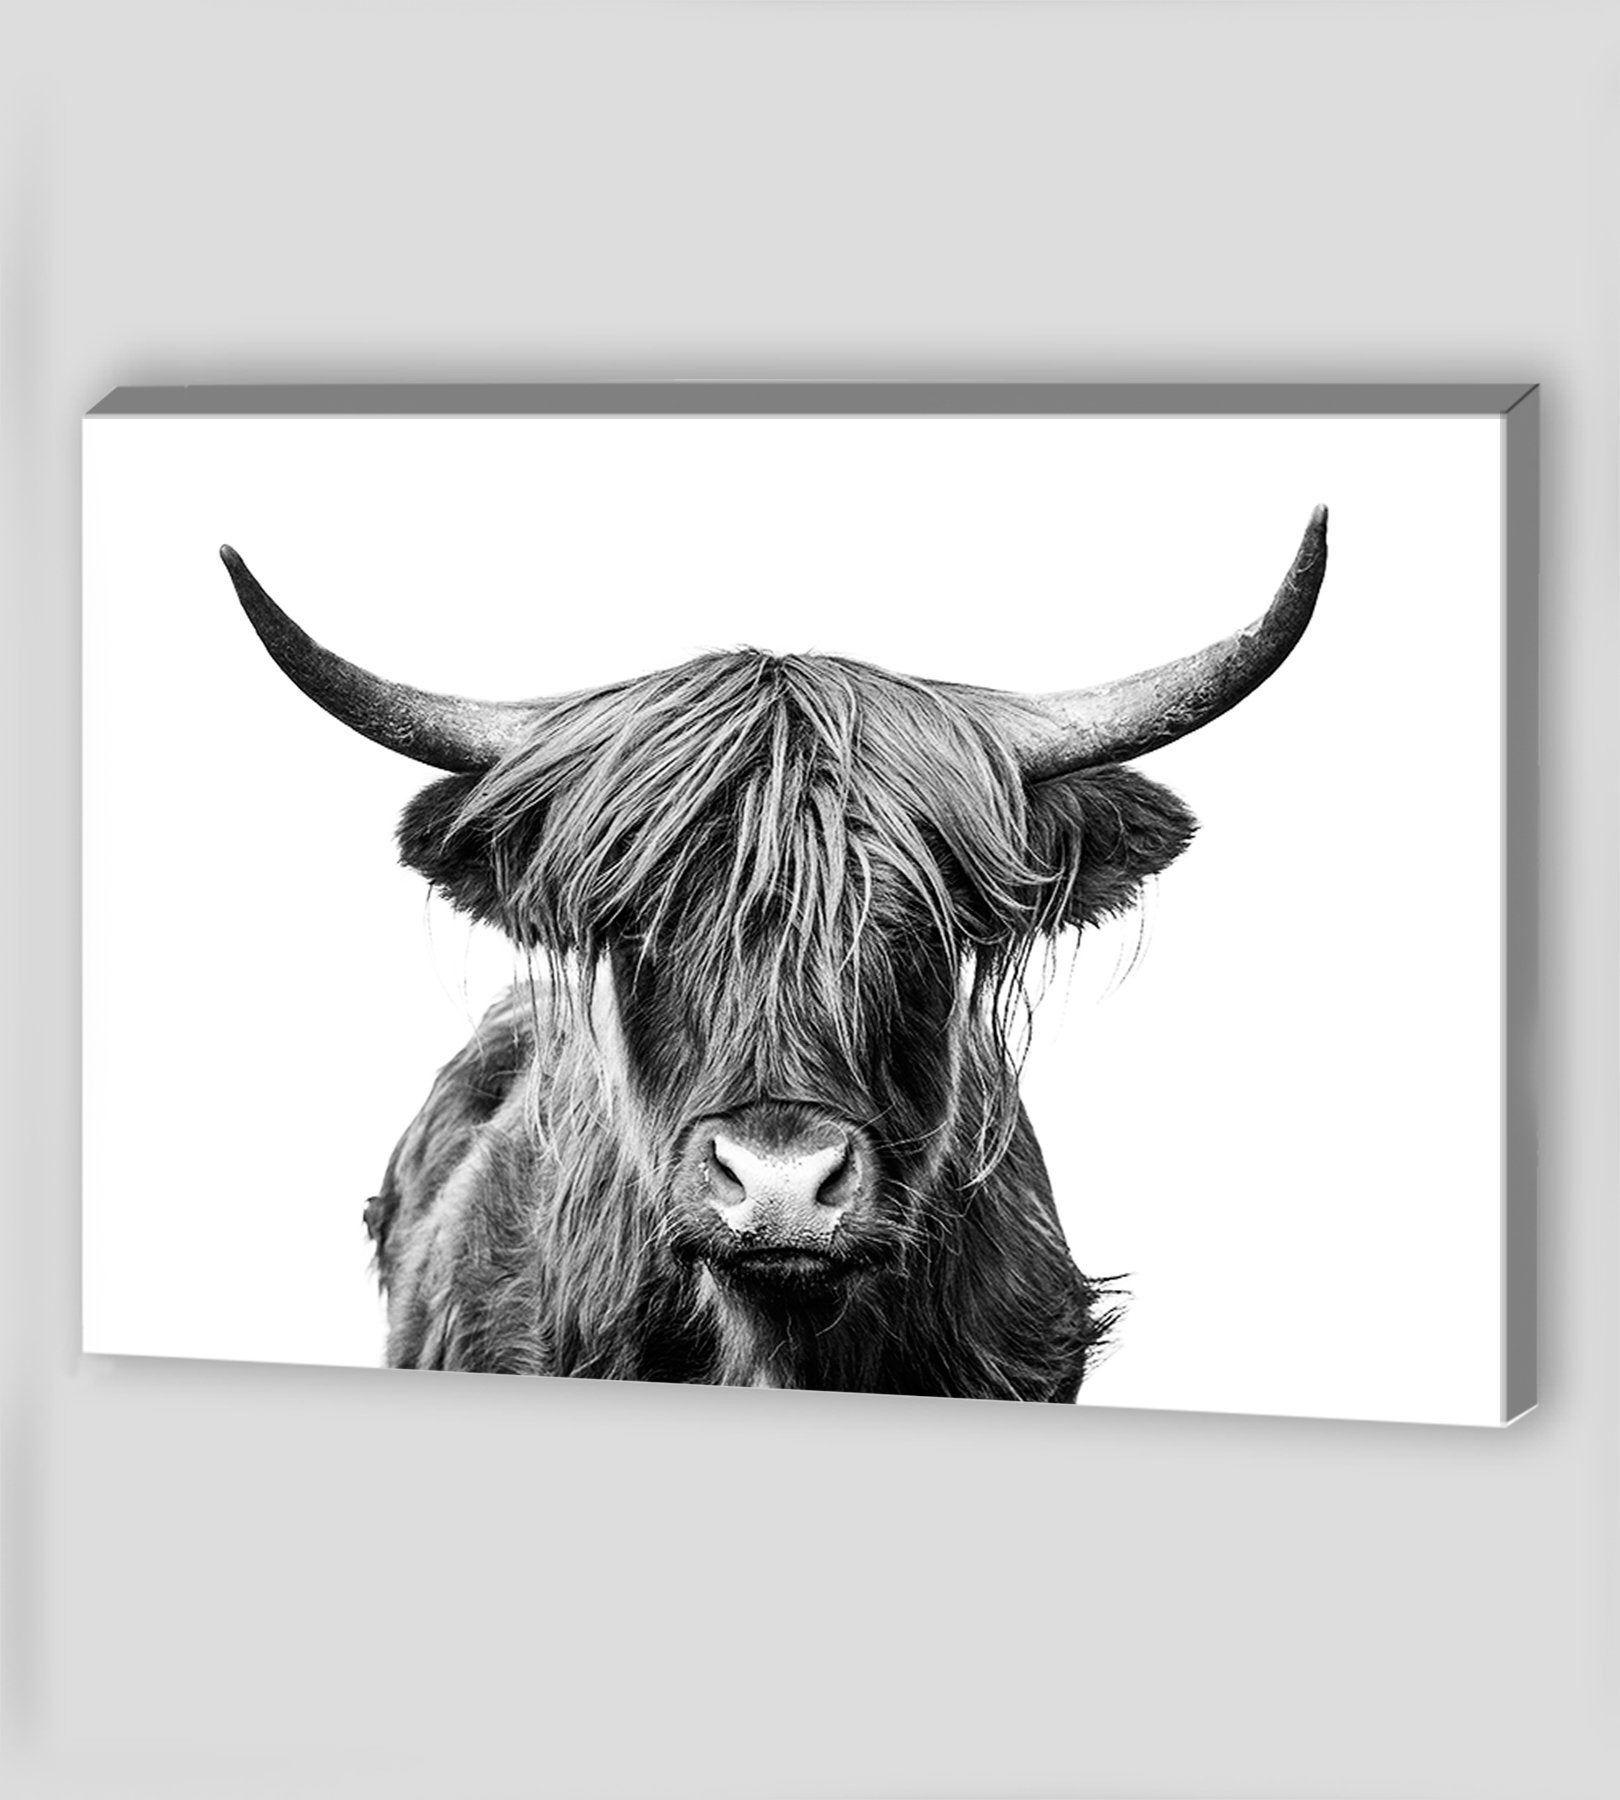 Canvas Art Highland Cow Wall Art Highland Cow Canvas Wall Art Etsy Cow Wall Art Highland Cow Canvas Cow Canvas